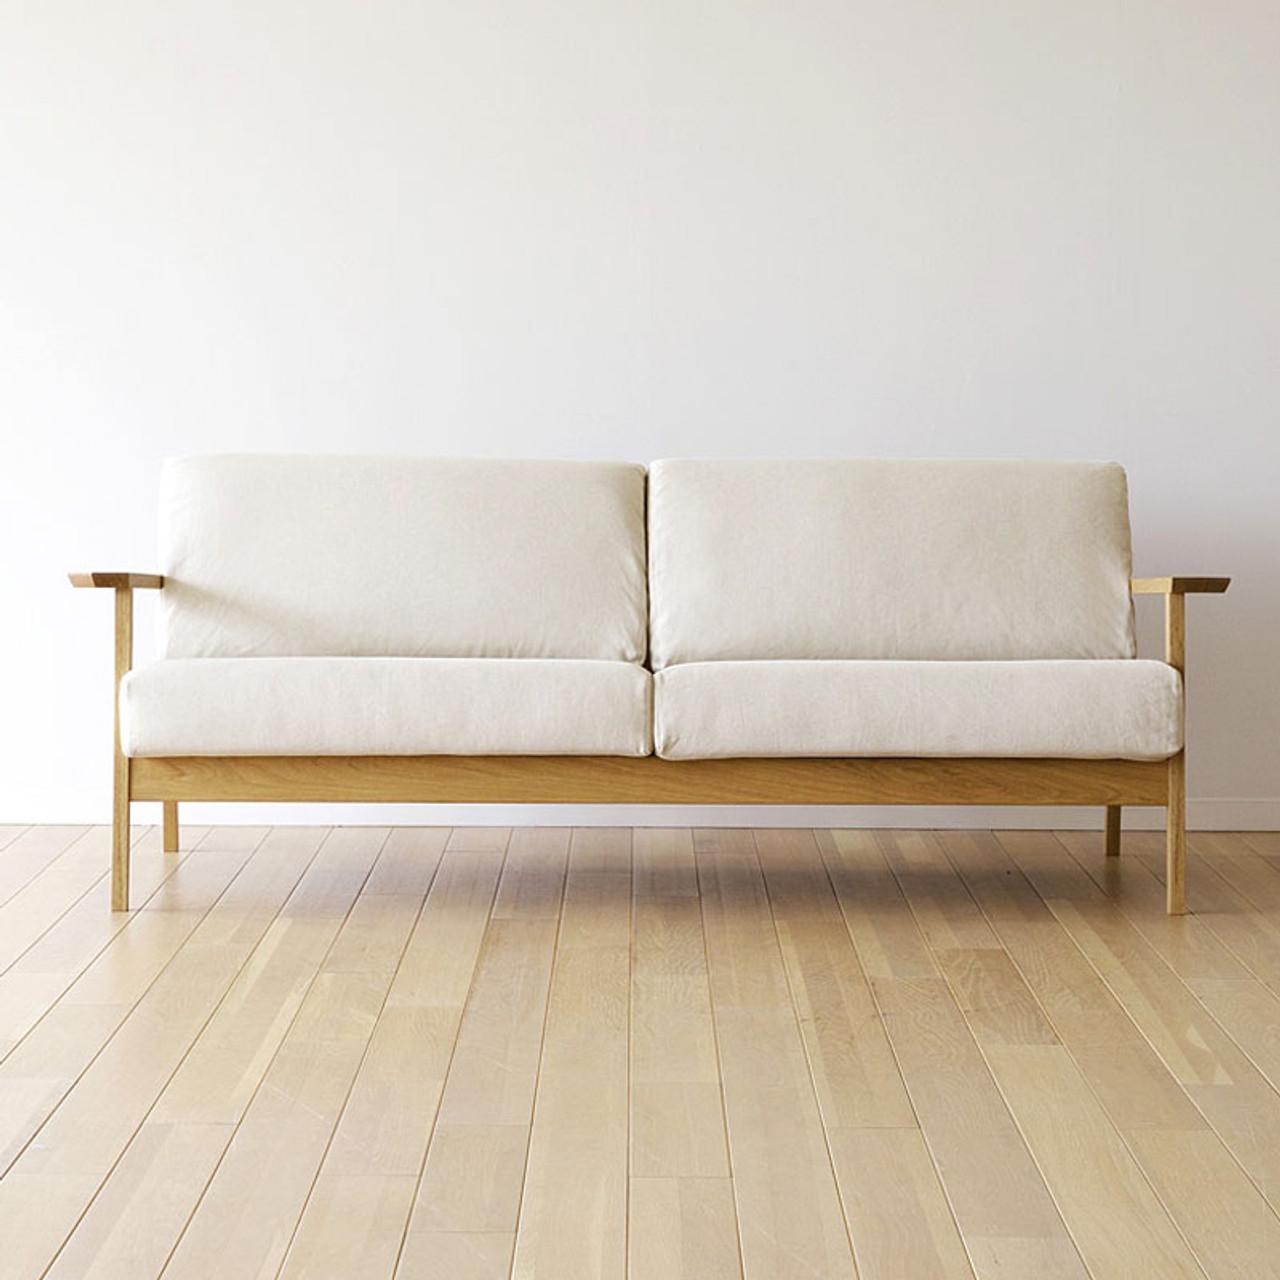 Surprising Cebu Sofa 3P Creativecarmelina Interior Chair Design Creativecarmelinacom